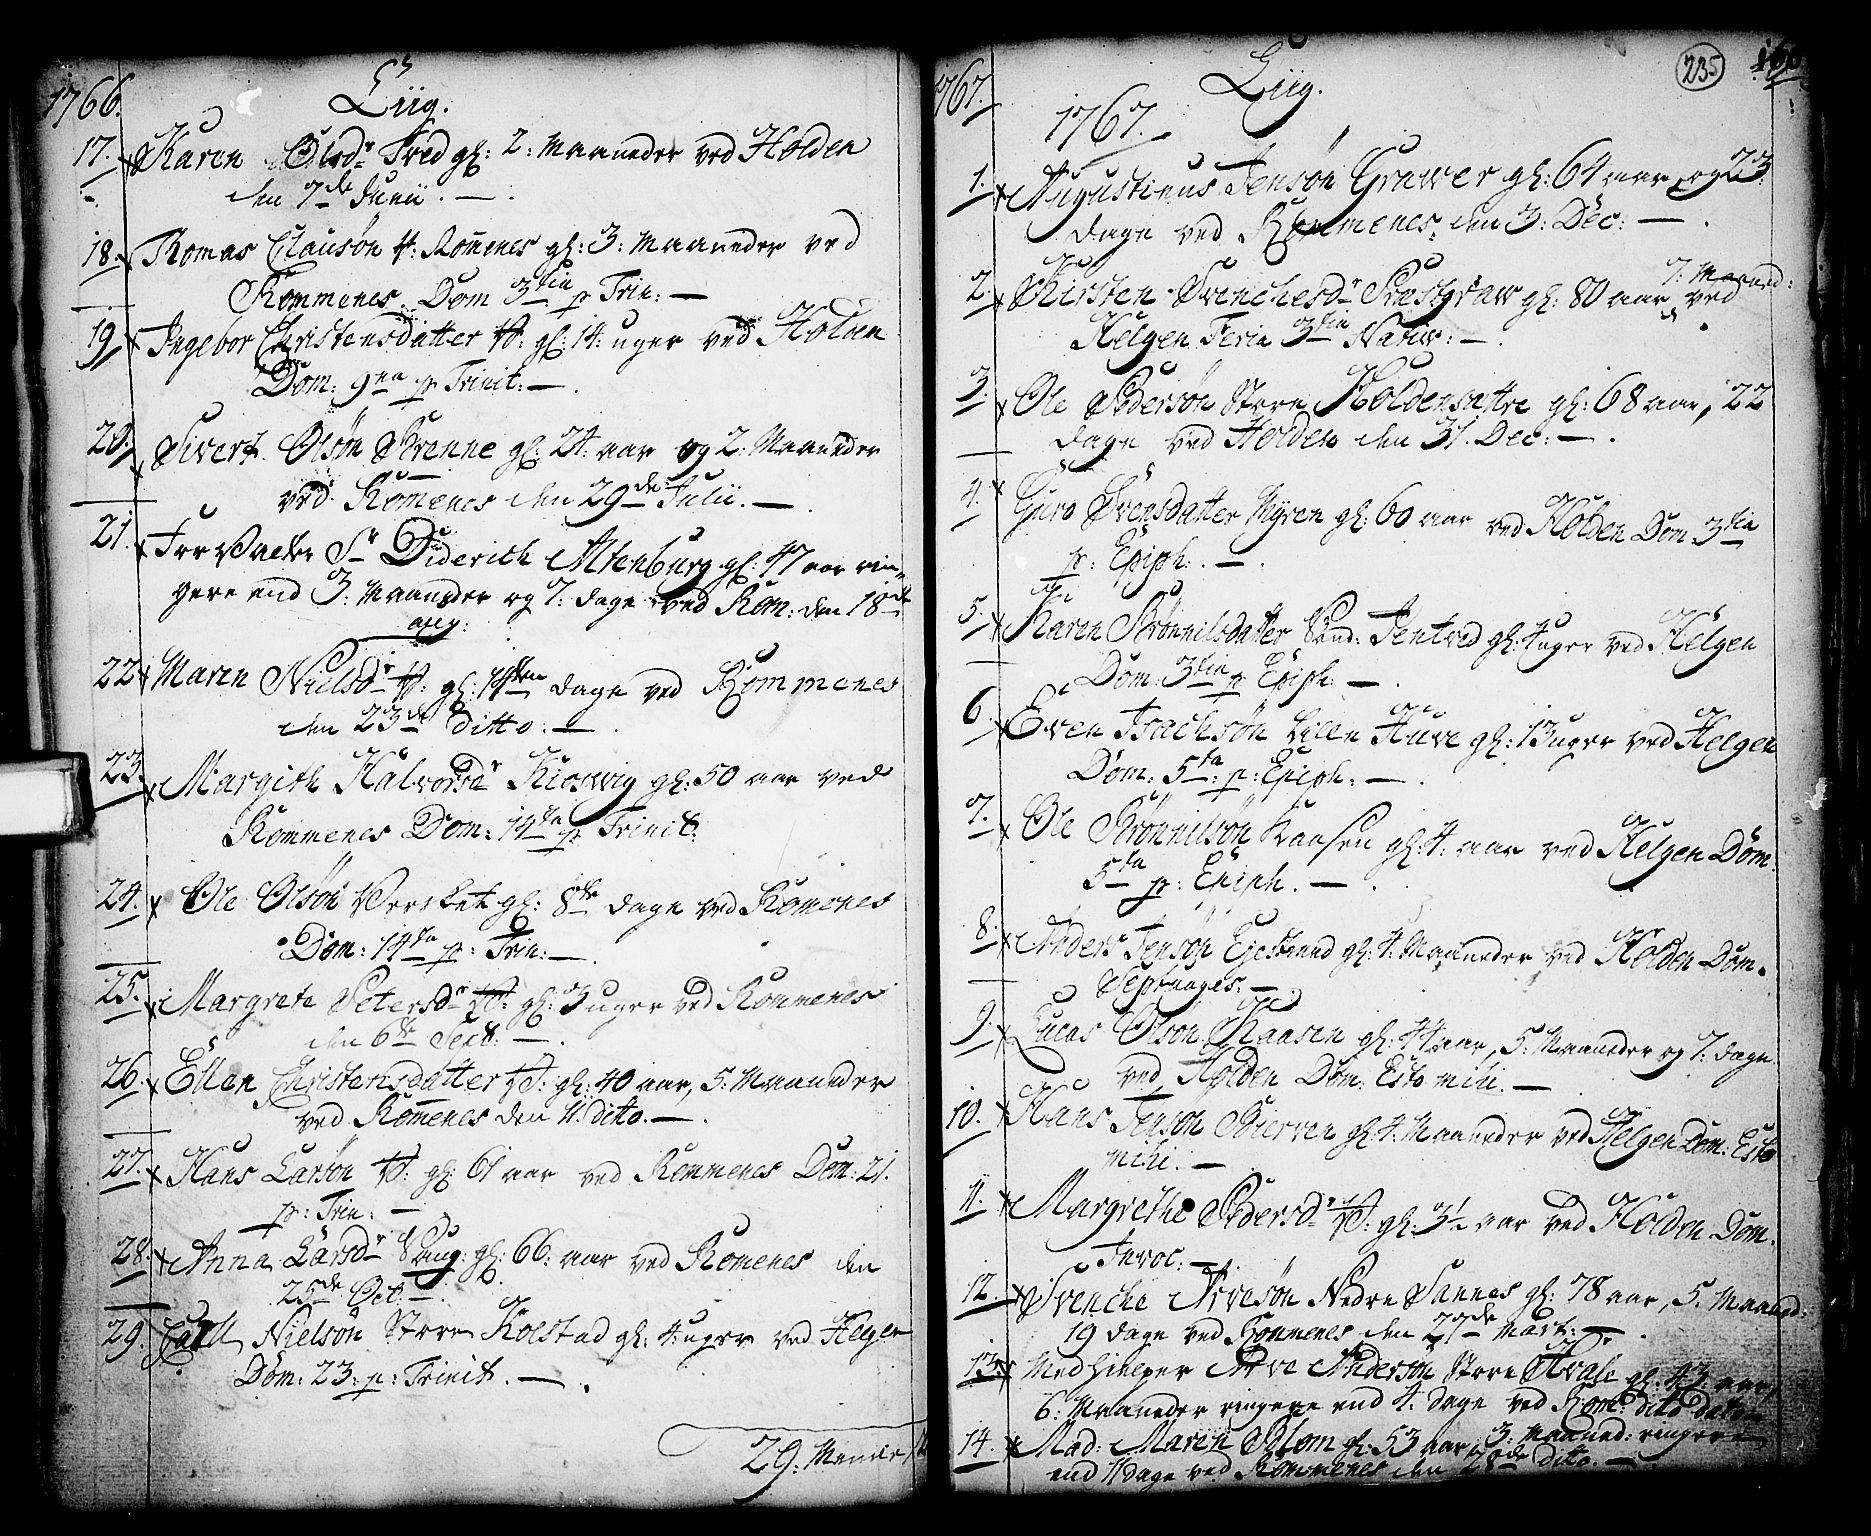 SAKO, Holla kirkebøker, F/Fa/L0001: Ministerialbok nr. 1, 1717-1779, s. 235